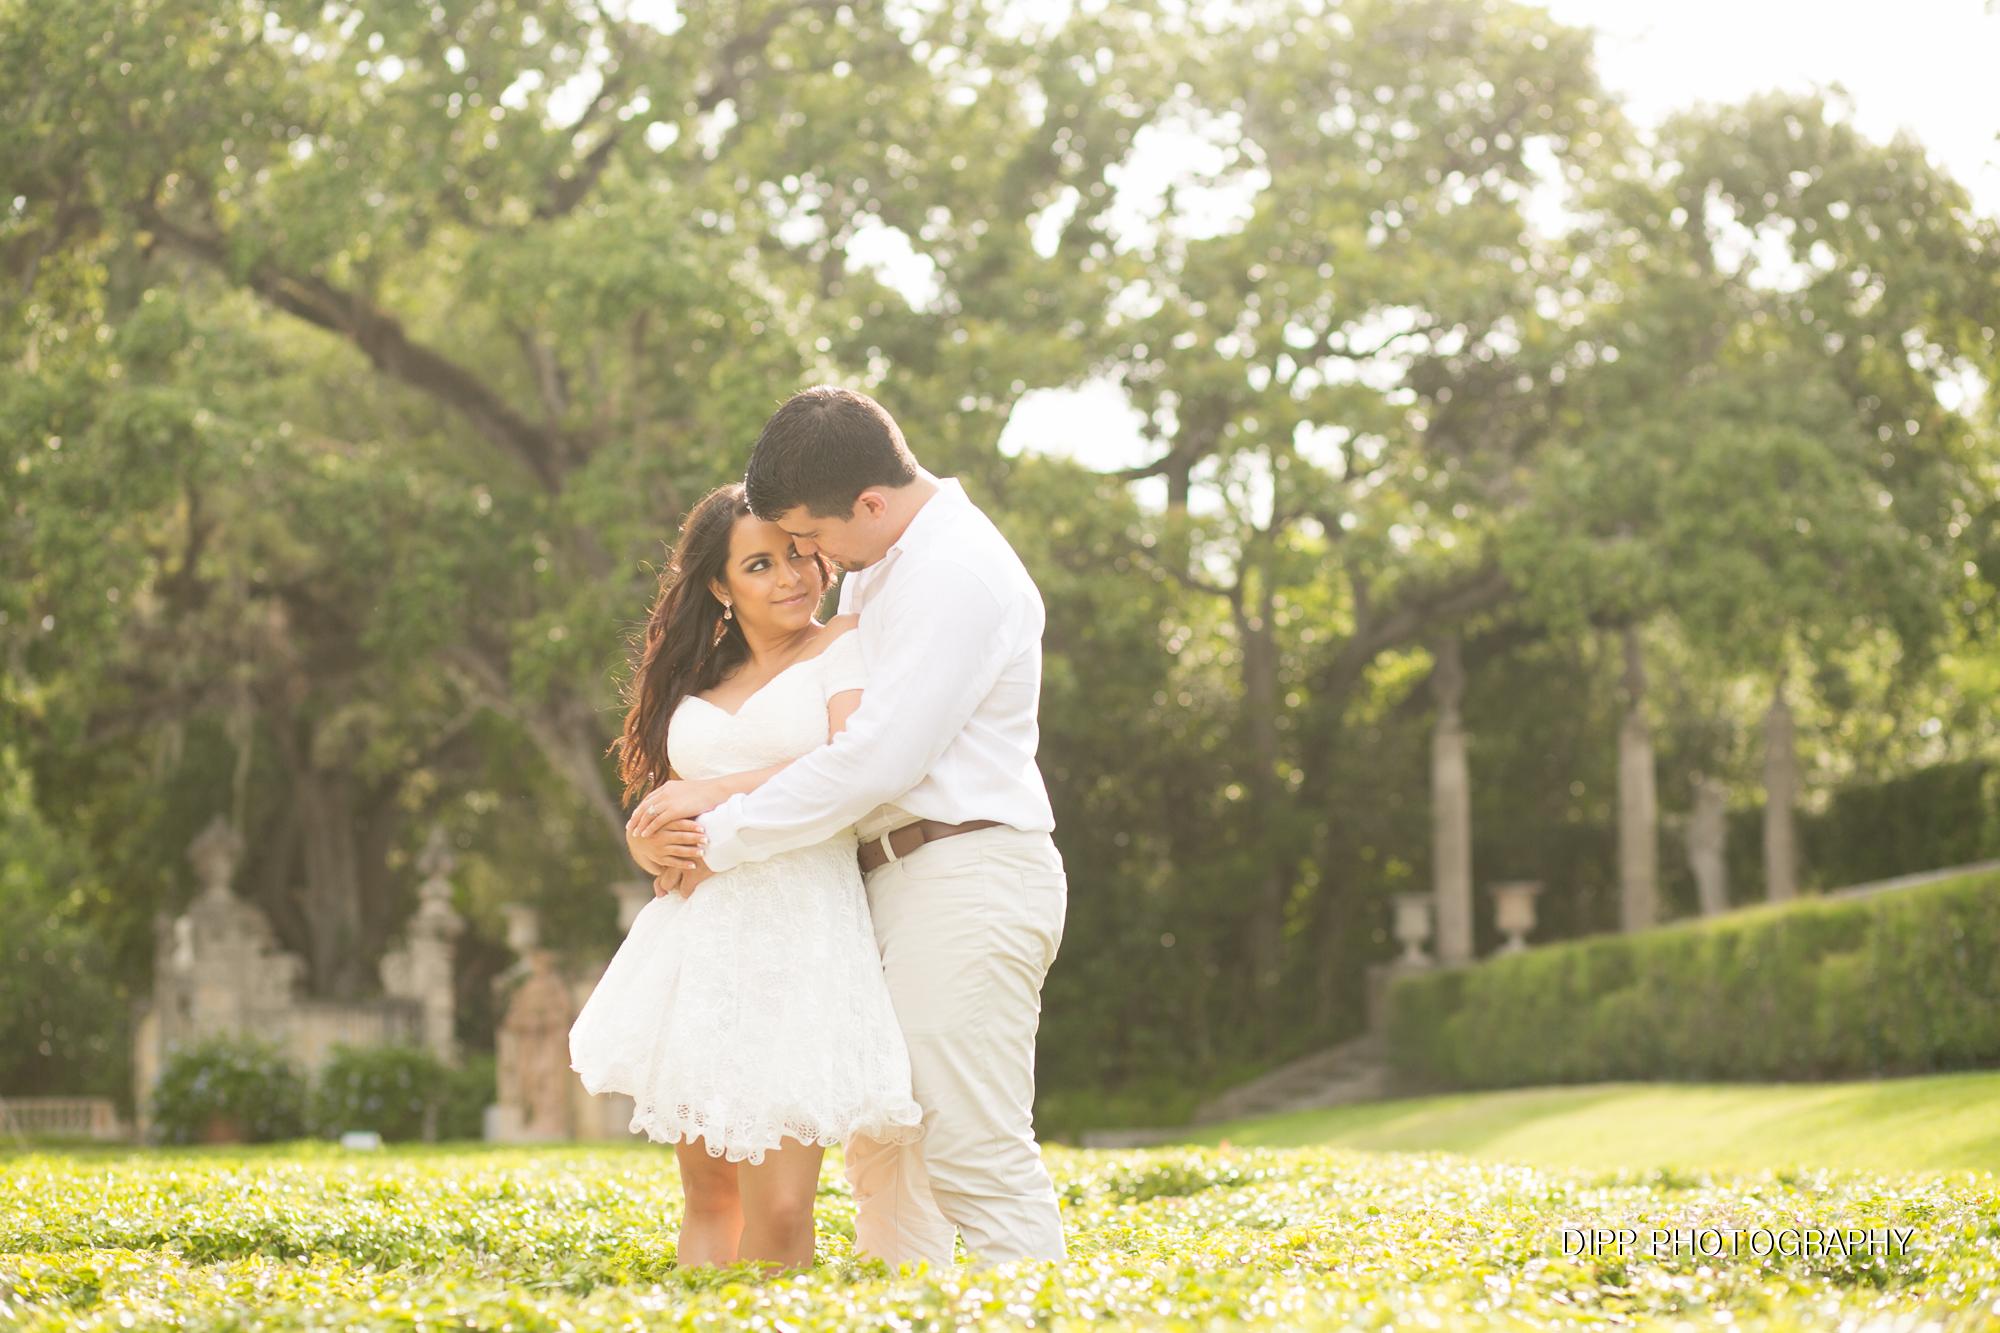 Dipp_2016 Alena & Alfredo ENGAGEMENT-607